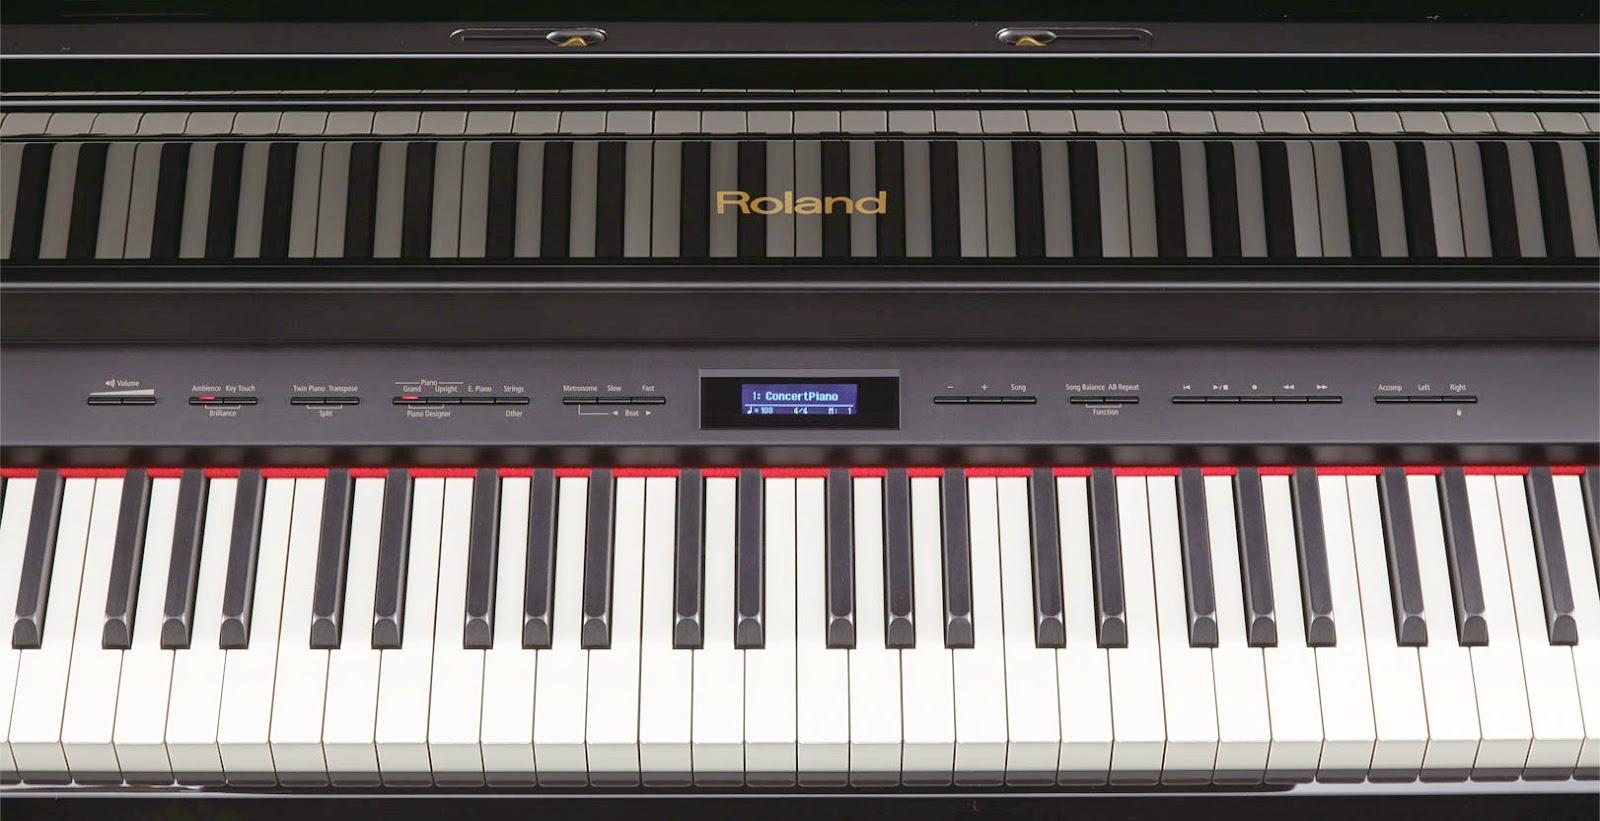 Roland control panel